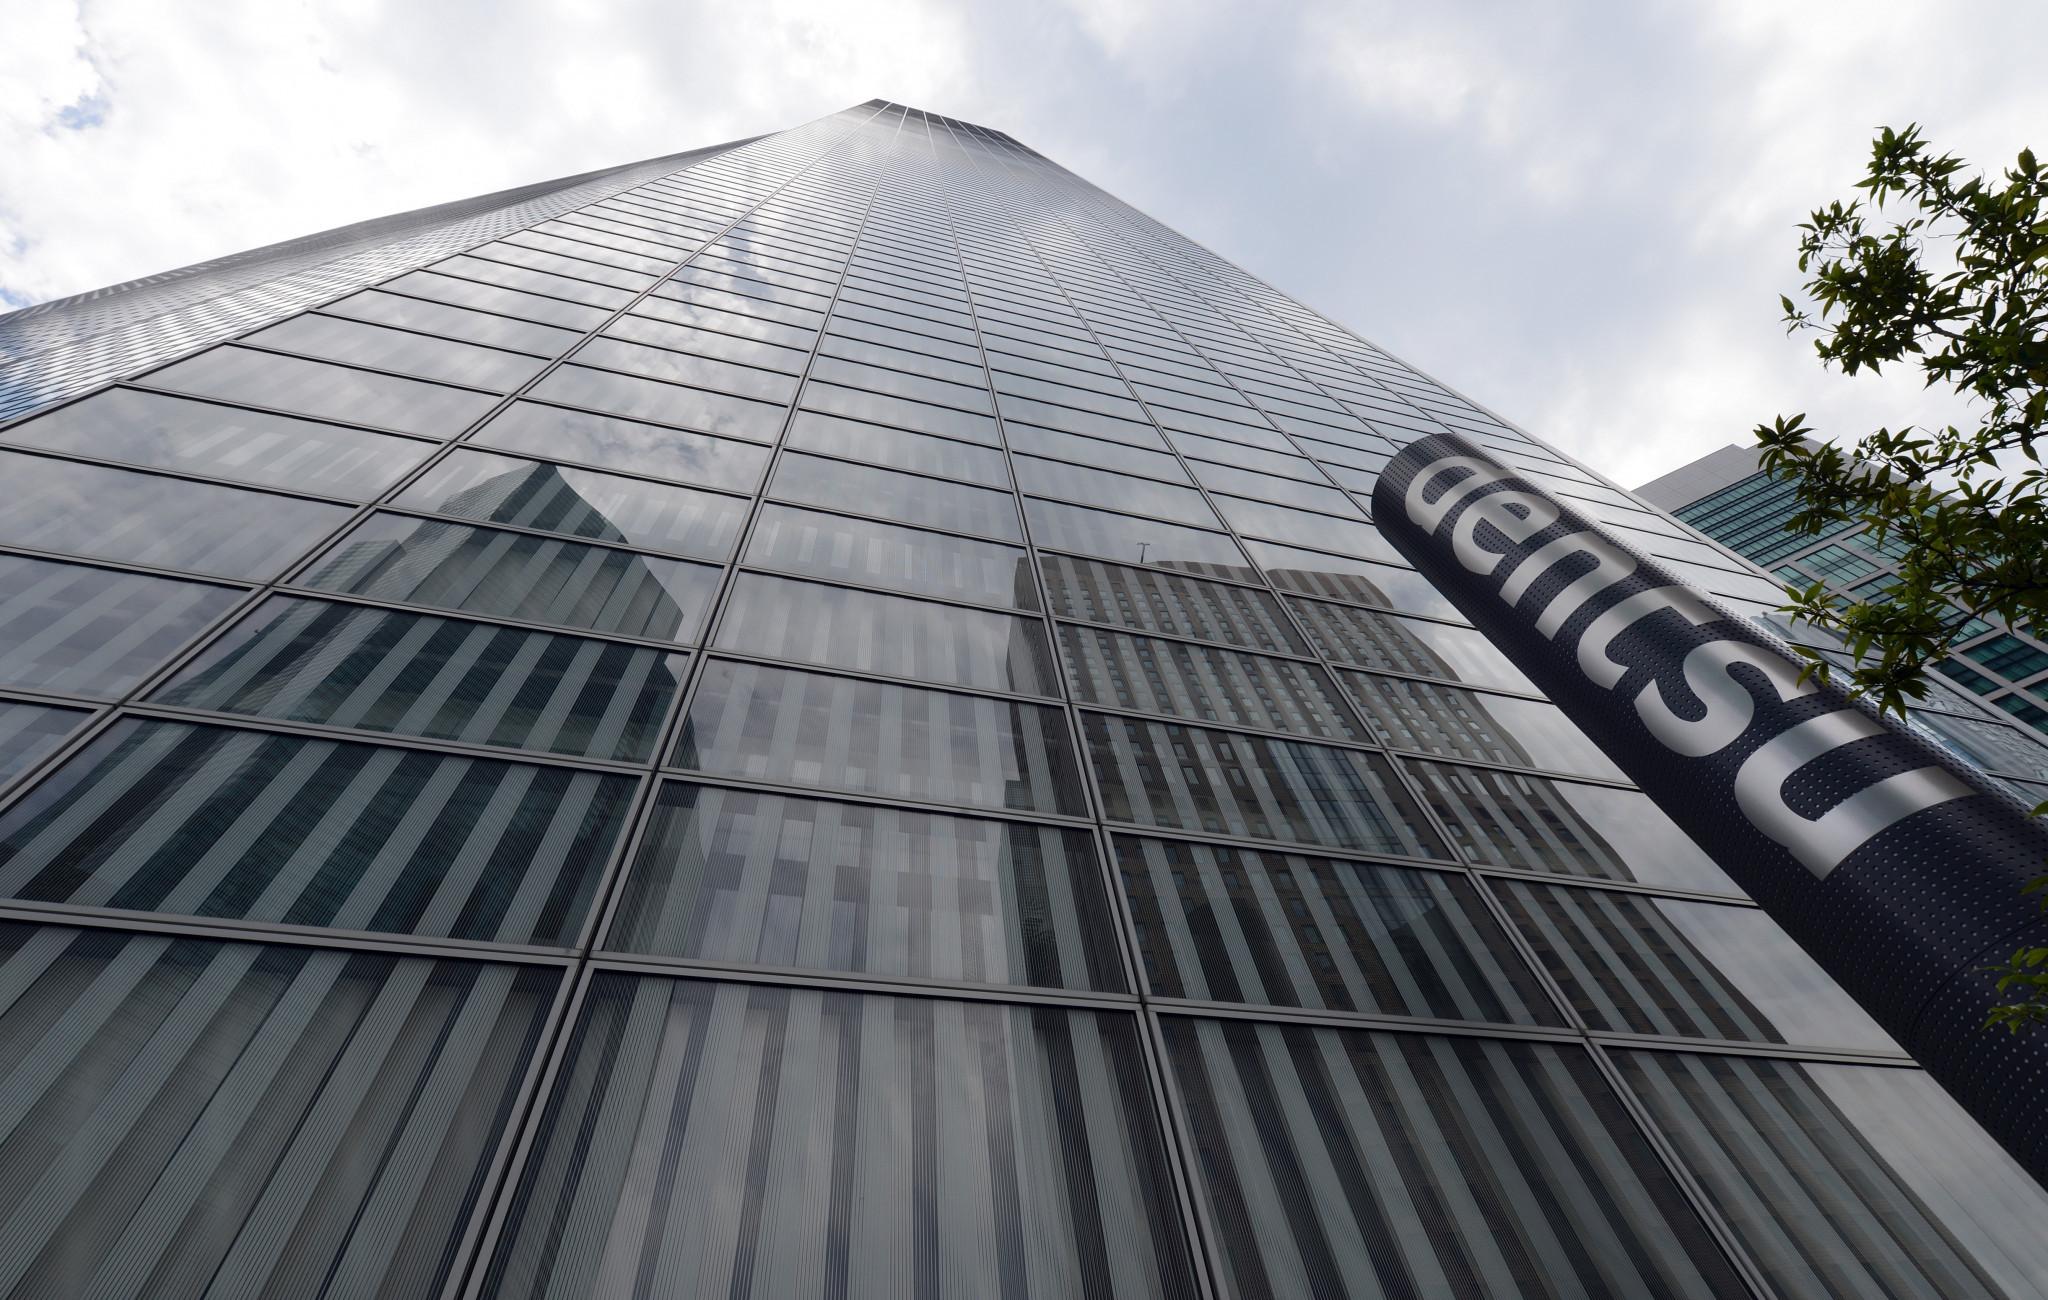 Dentsu's Tokyo headquarters evacuated over bomb threat